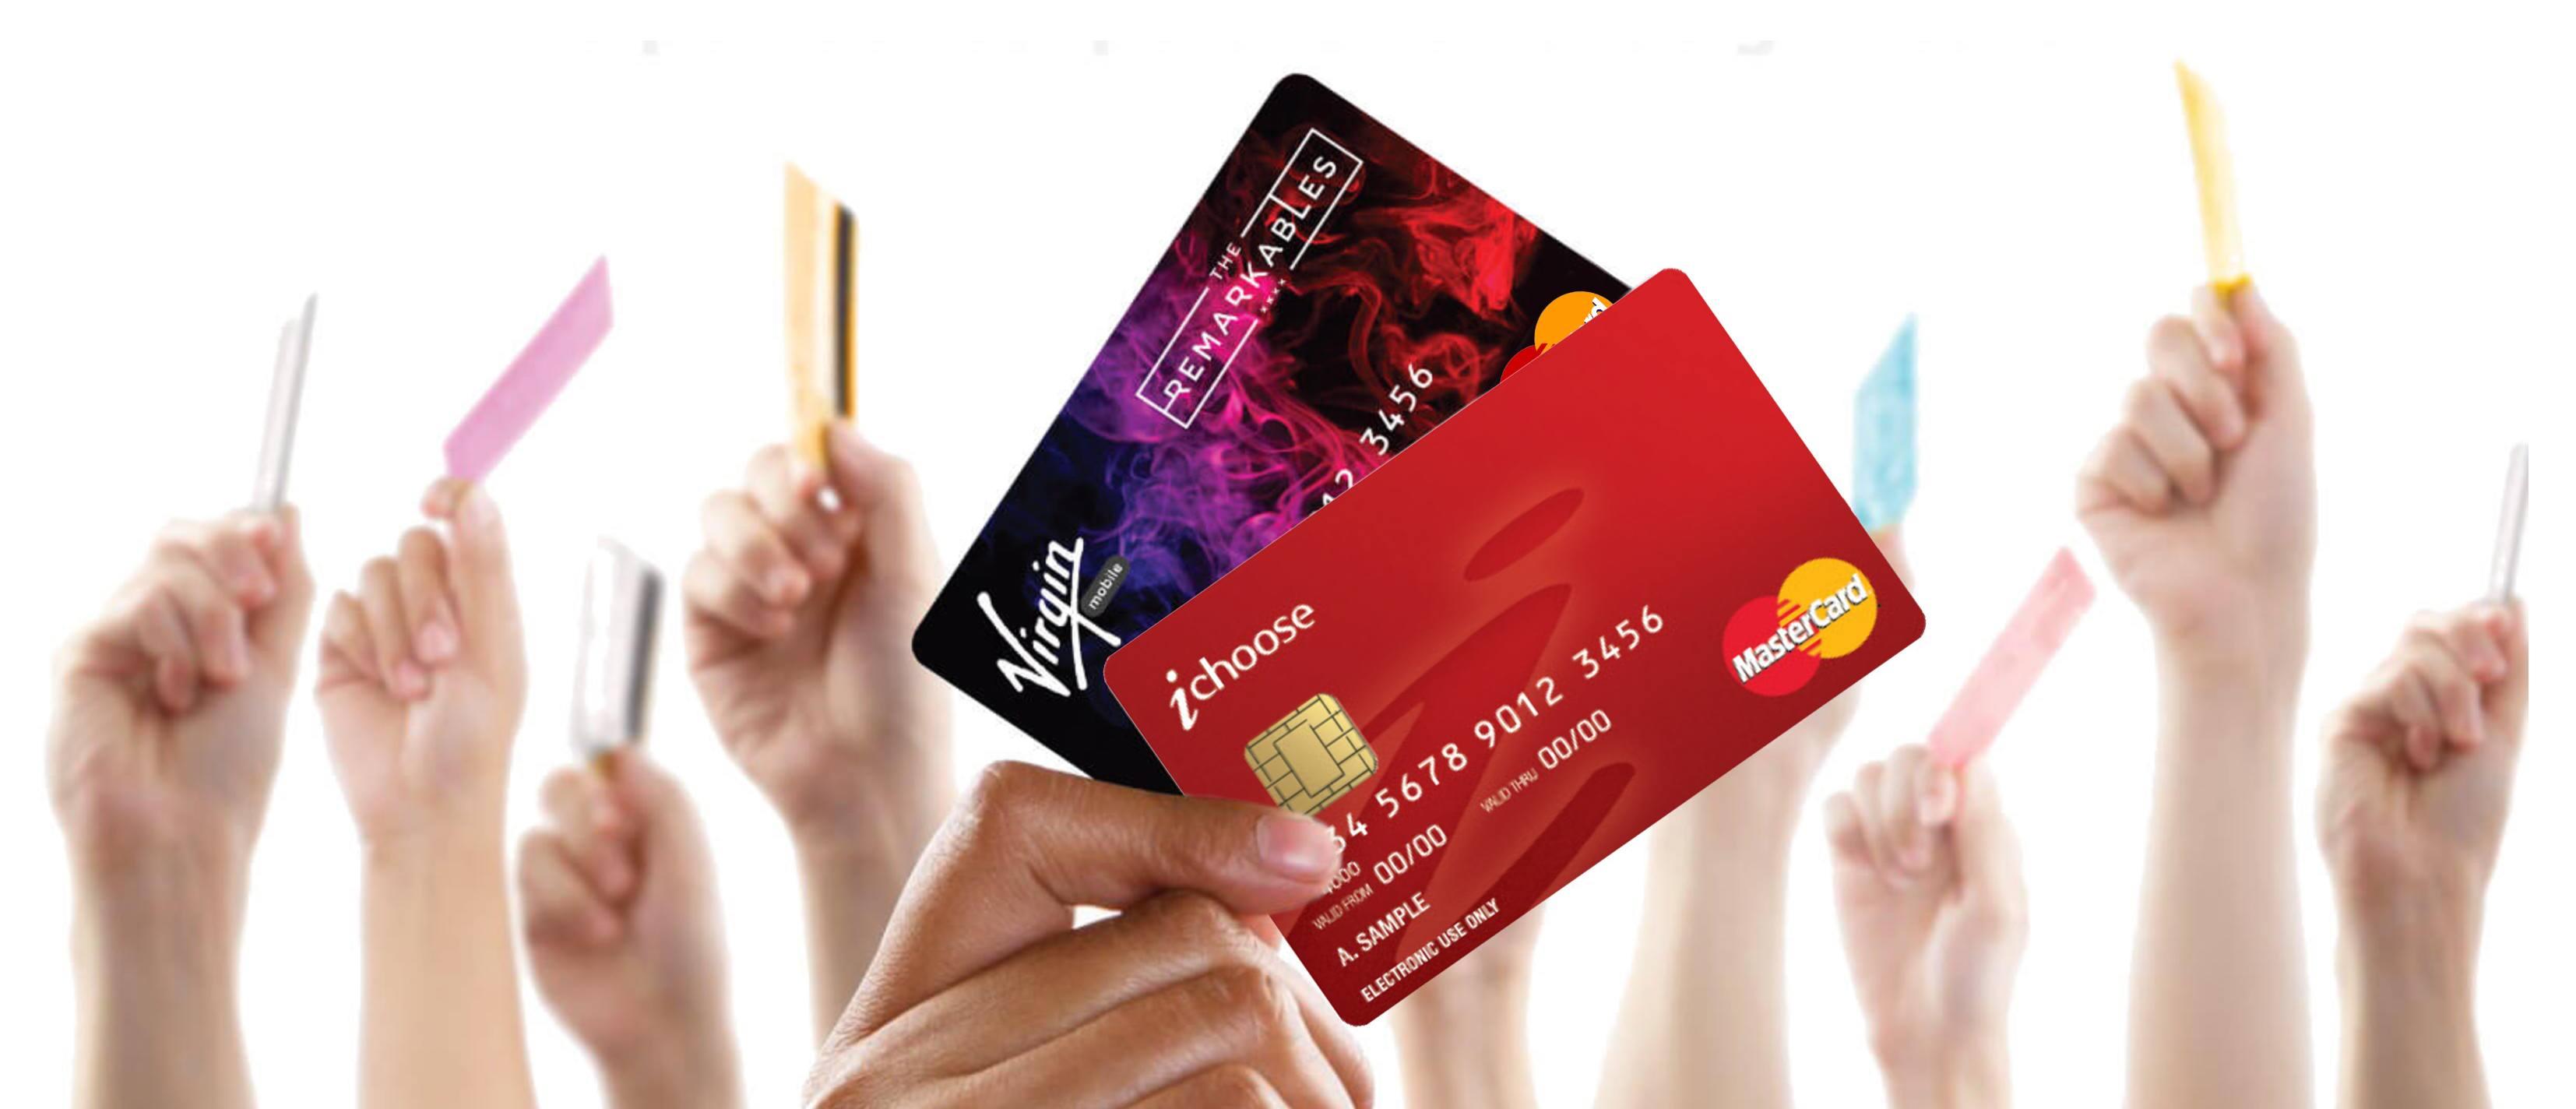 iChoose VISA prepaid branded and non-branded cards